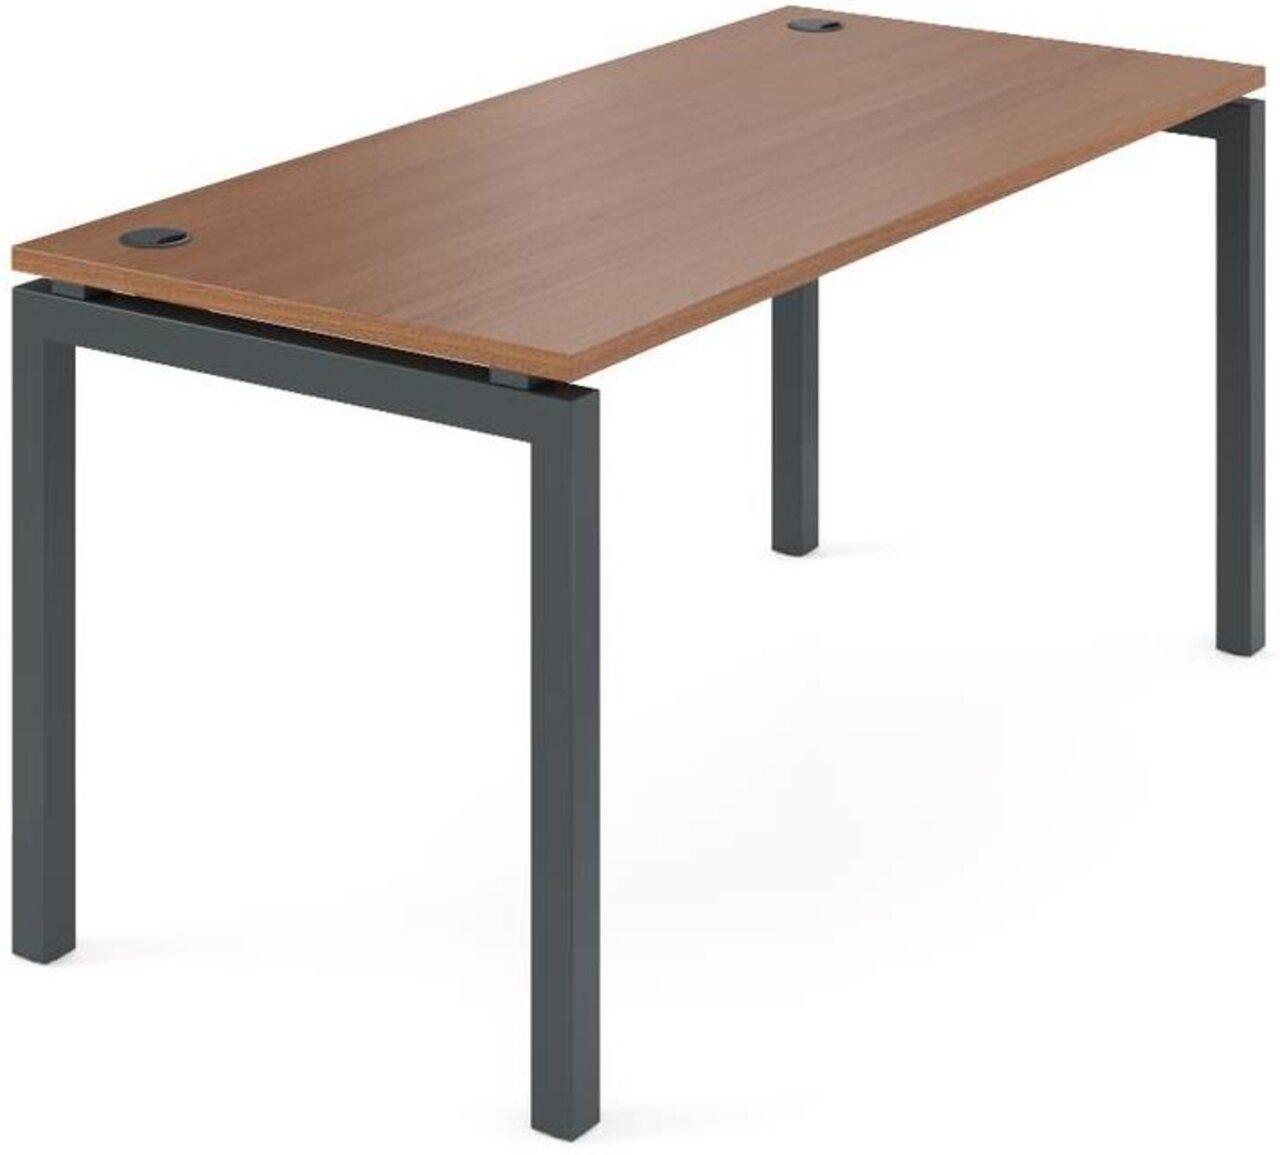 Стол на металлокаркасе  Арго 160x73x76 - фото 3